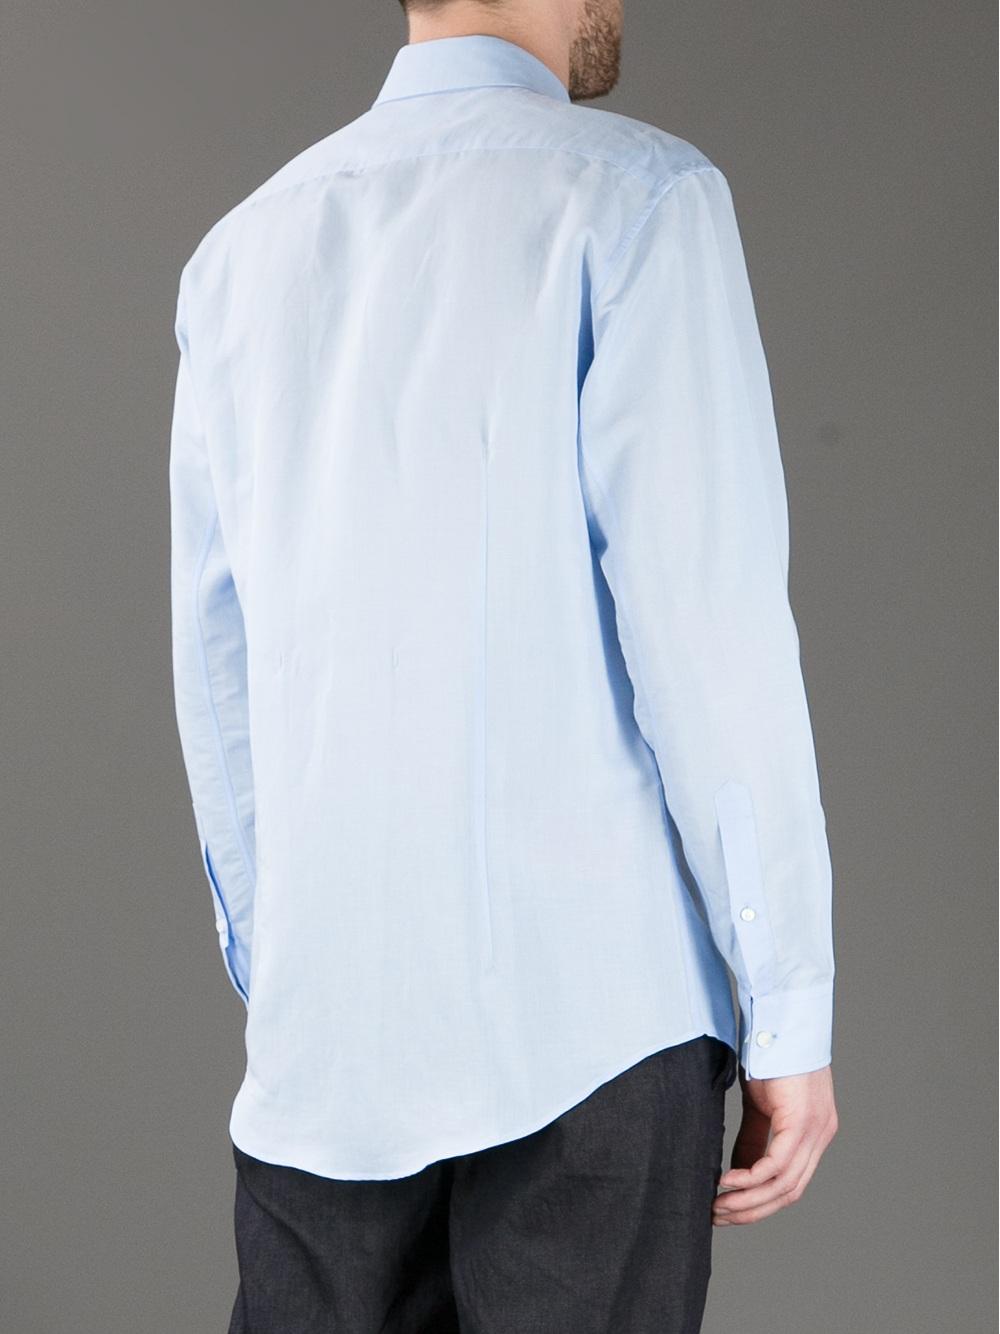 New Formal Shirt Design For Men 2013 Lyst - Marc Jacobs Ple...